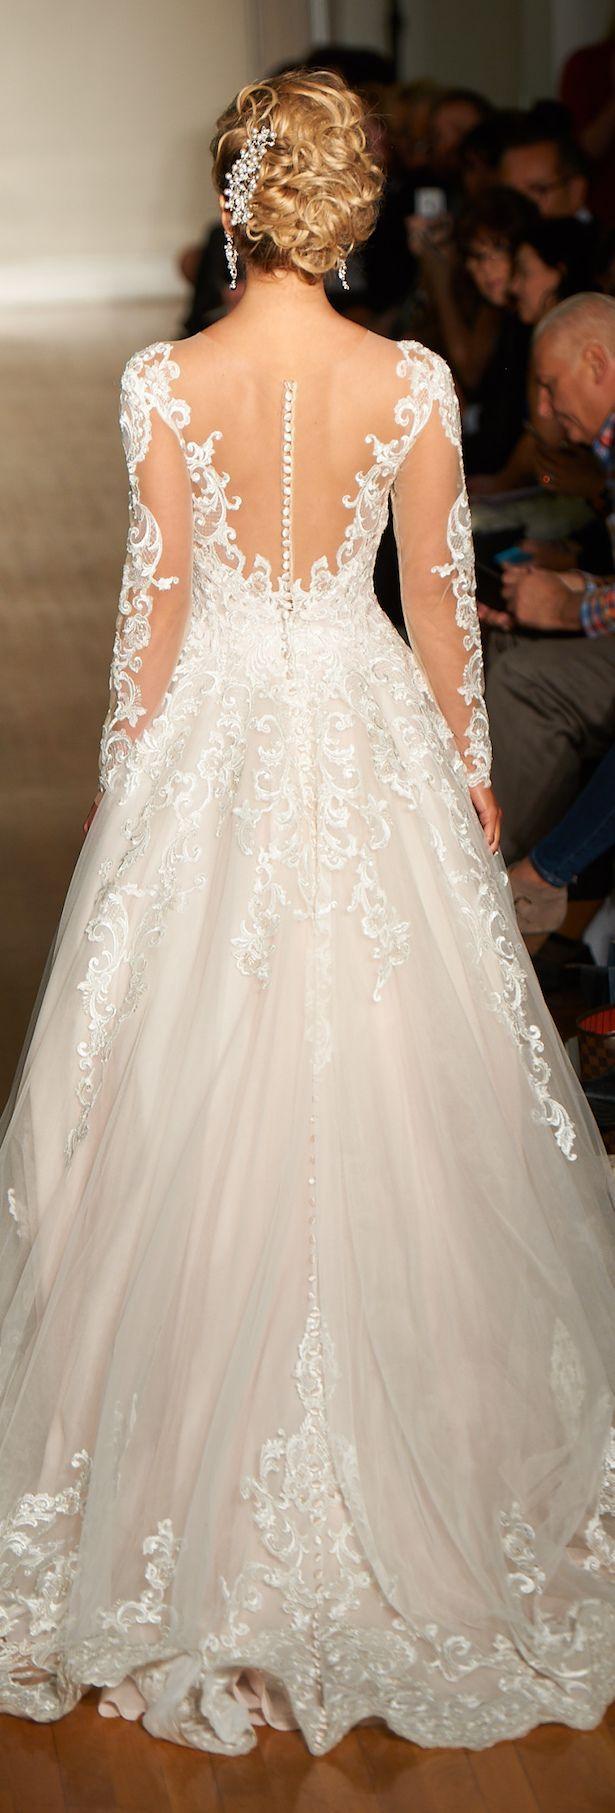 New York Bridal Week - Allure Bridals Spring 2017 Wedding Dress